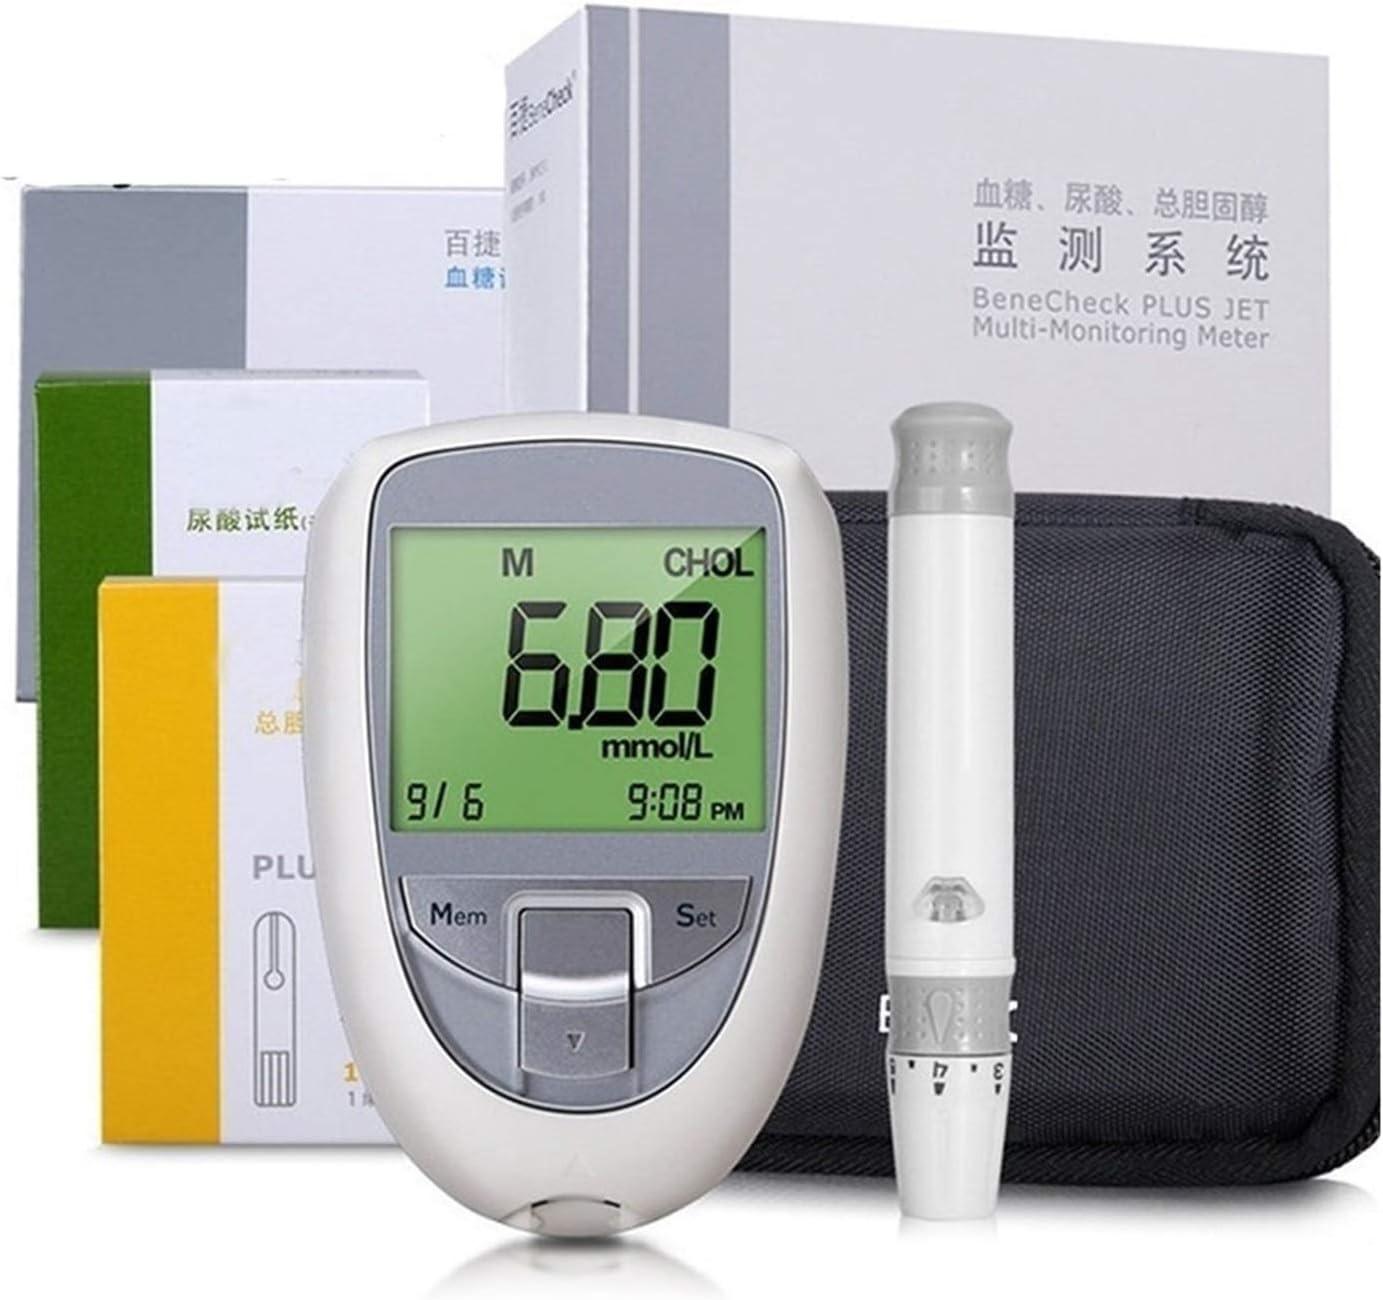 HTTDD 3 in 1 Blood Discount is also underway New York Mall Glucose Sugar Acid Cholest Meter Uric